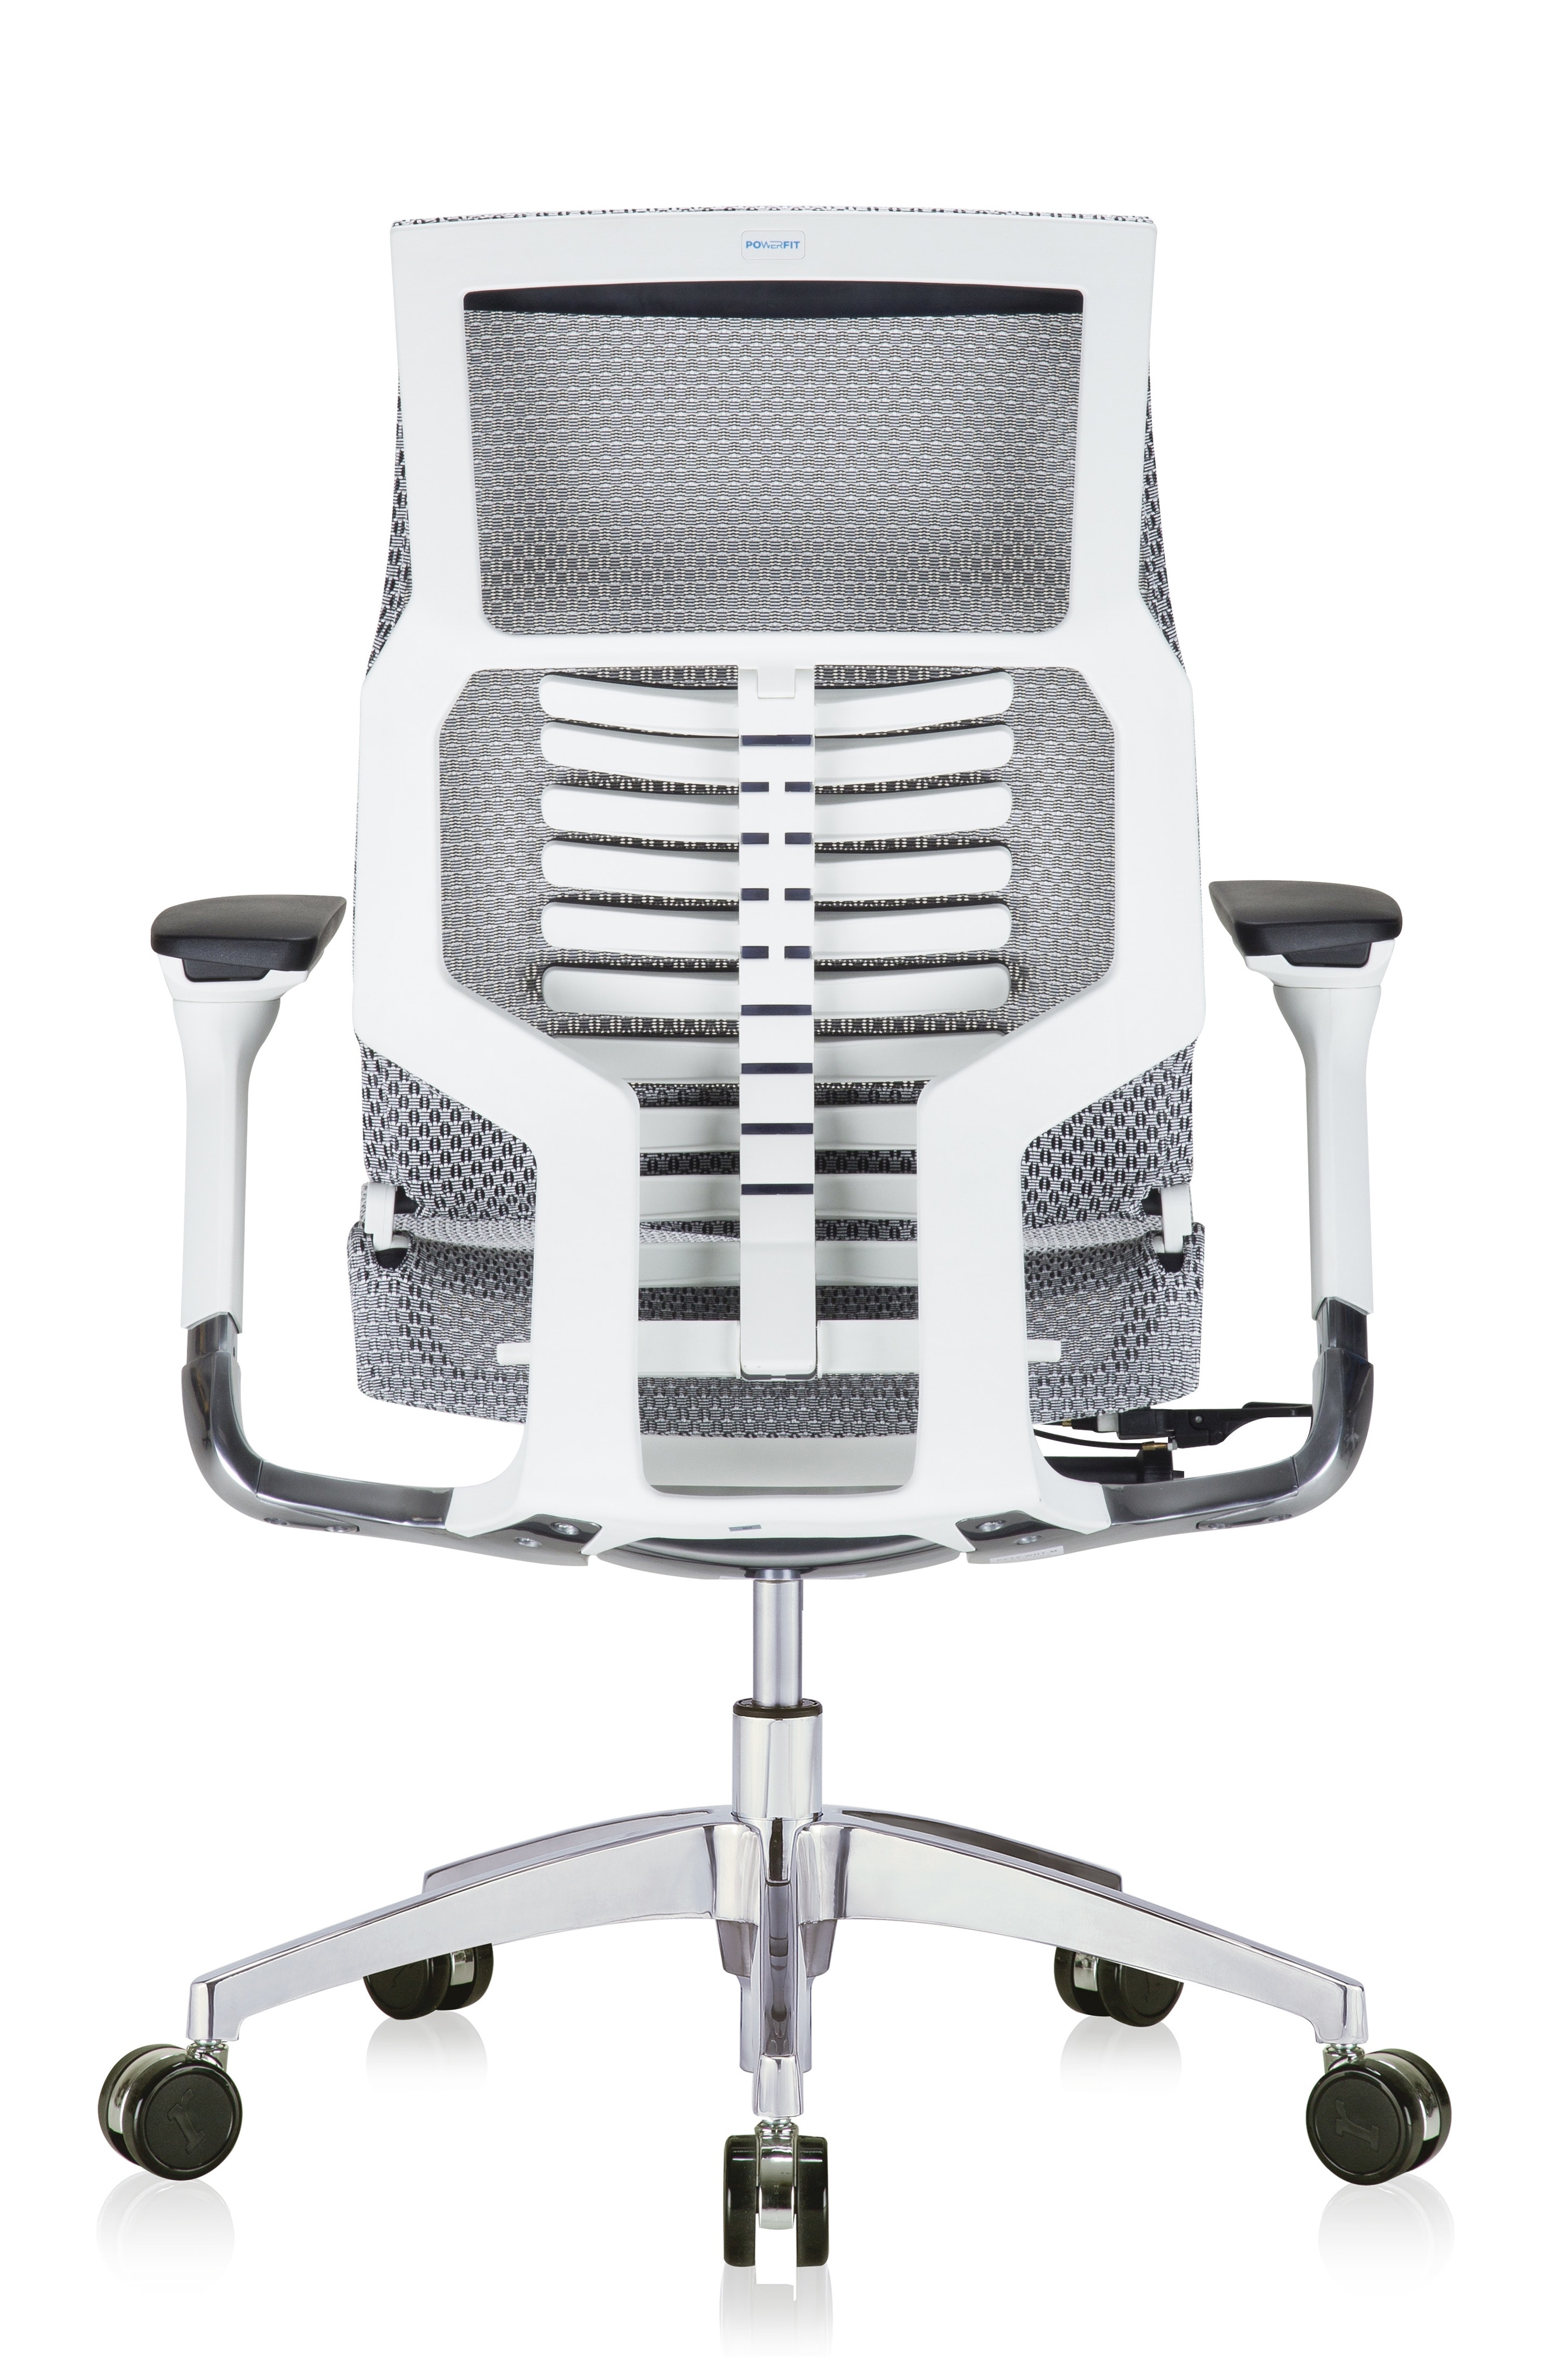 powerfit bionic chair back